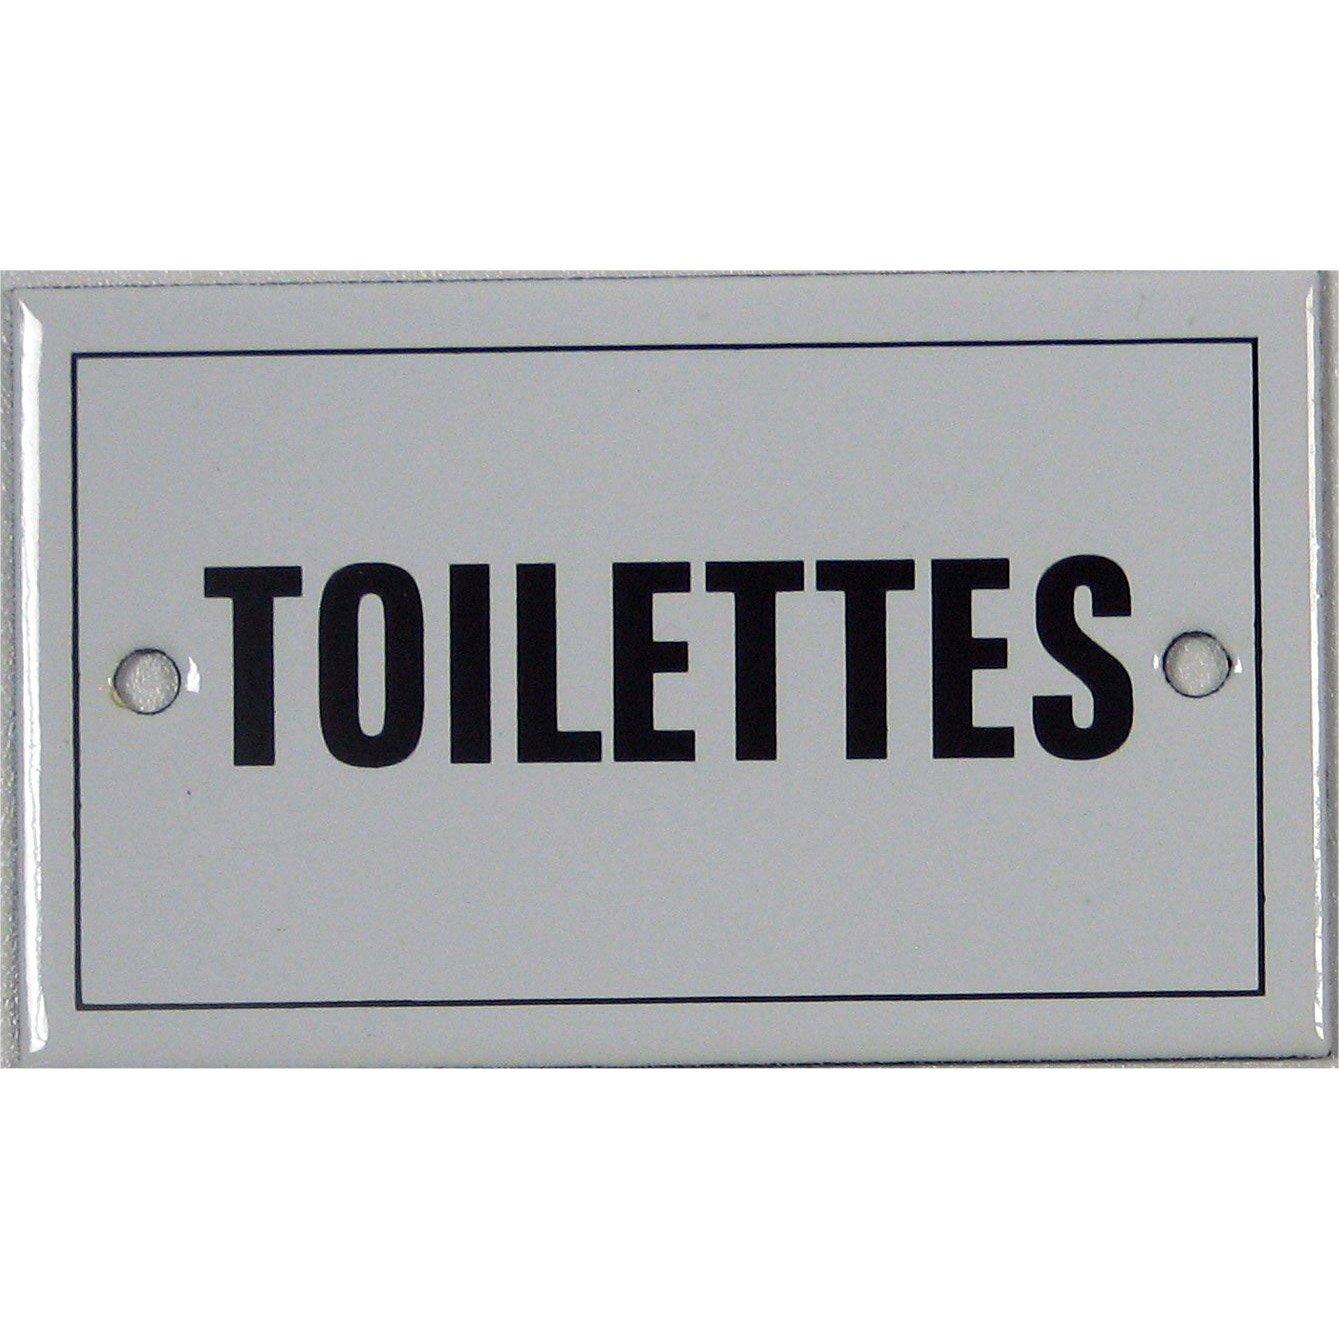 plaque toilettes en acier leroy merlin. Black Bedroom Furniture Sets. Home Design Ideas